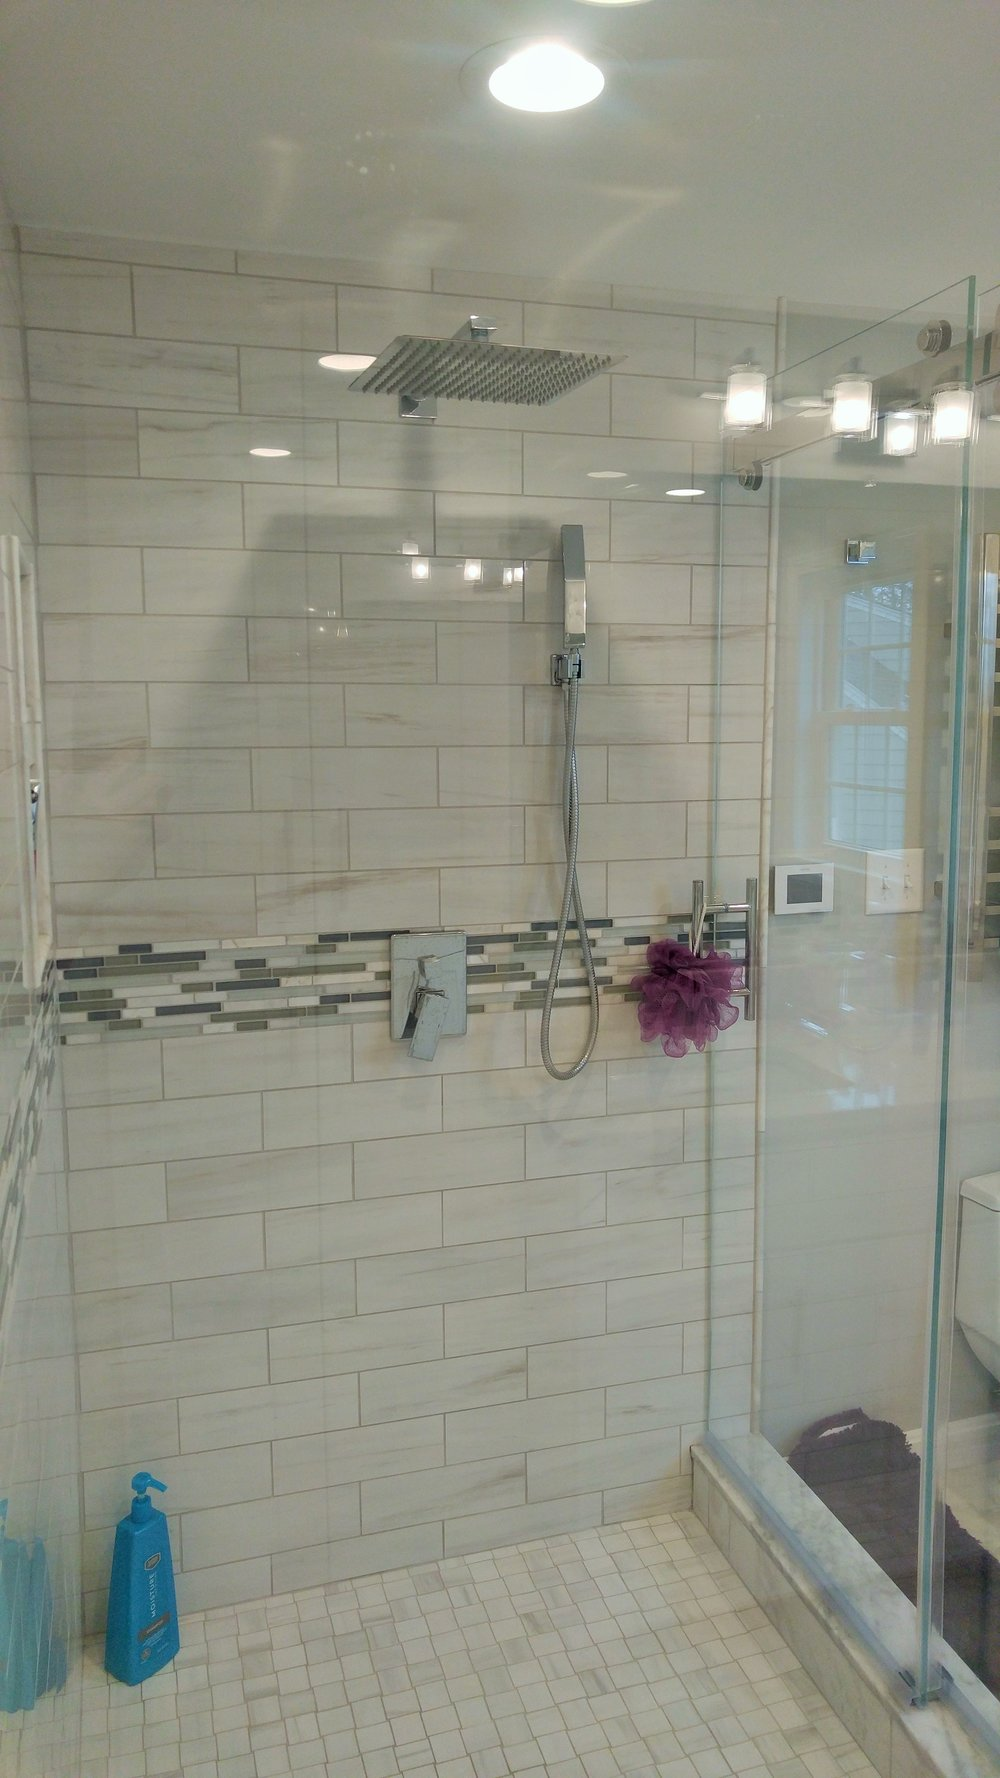 Upscale Bathroom Remodel - Shrewsbury MA